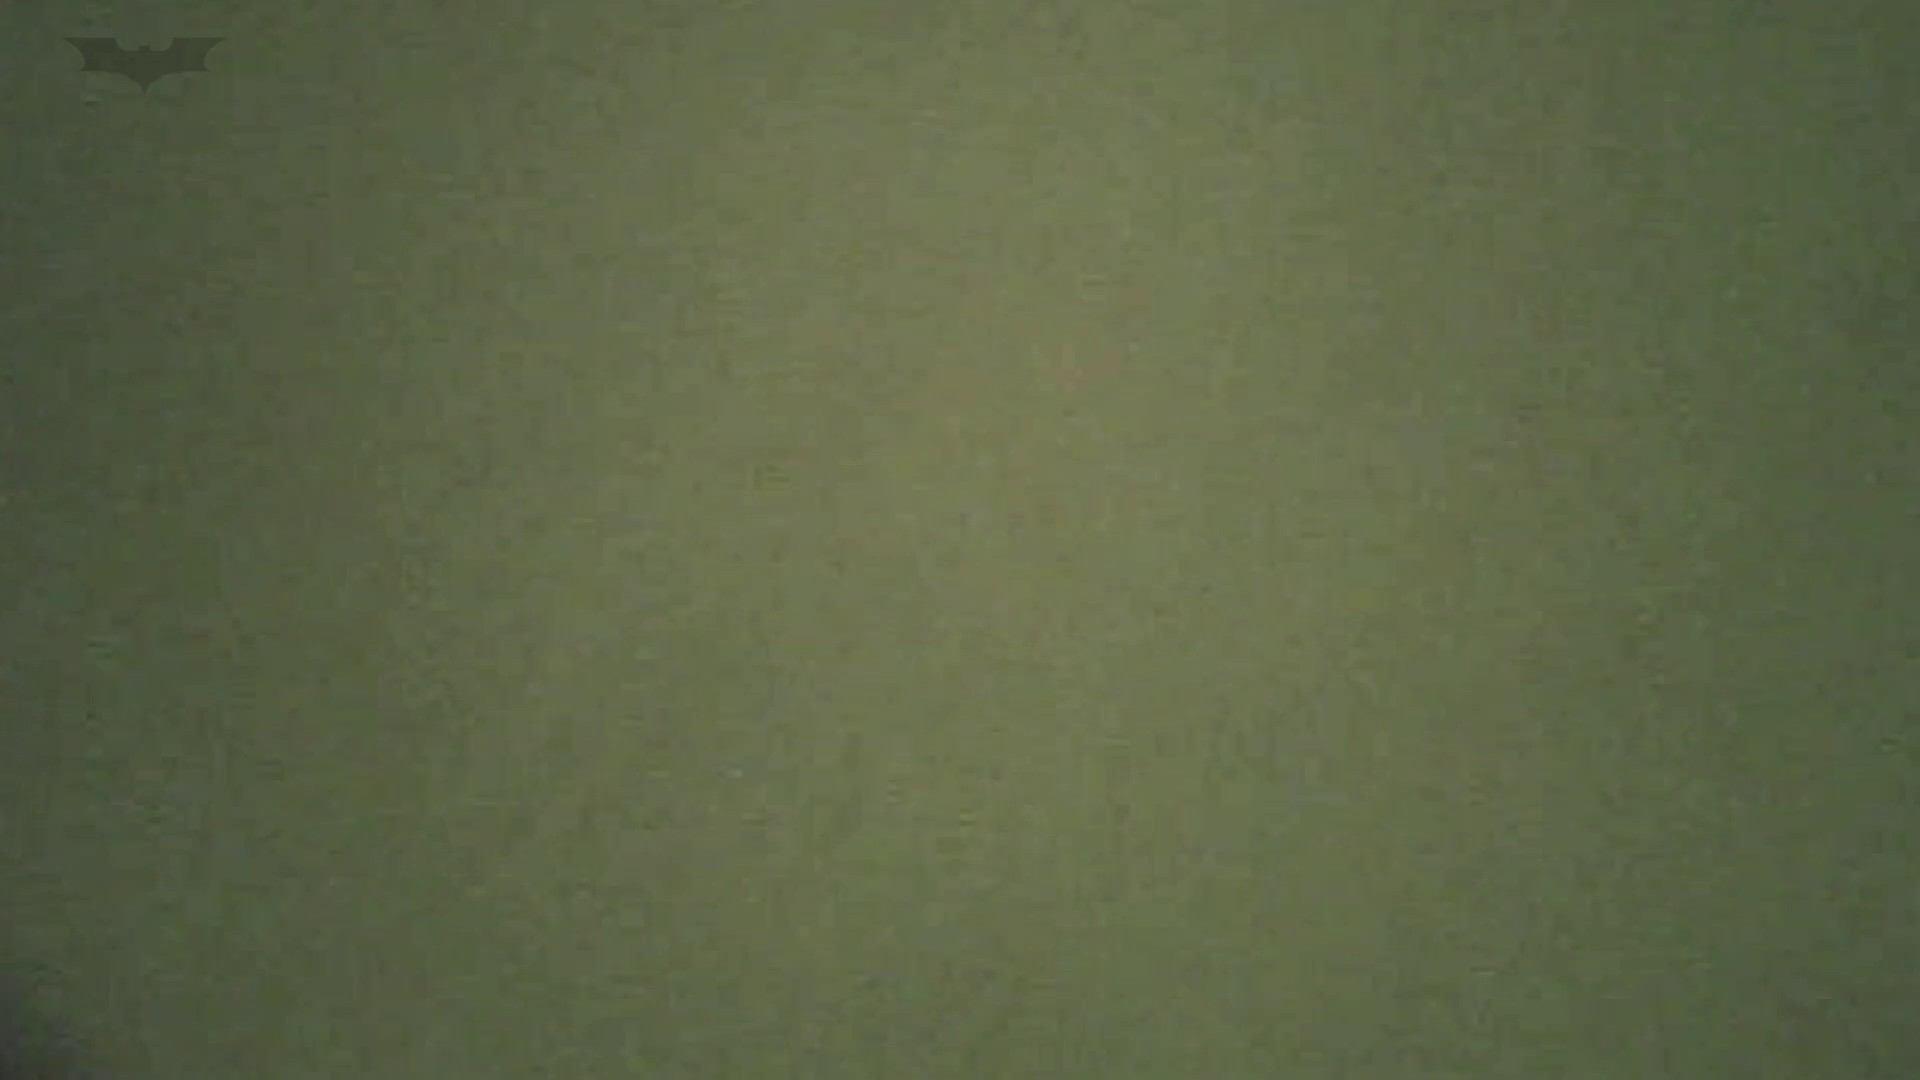 Part2 合コンで知り合った ありさちゃん Vol.02 マンコ丸見え編 丸見え われめAV動画紹介 79連発 20